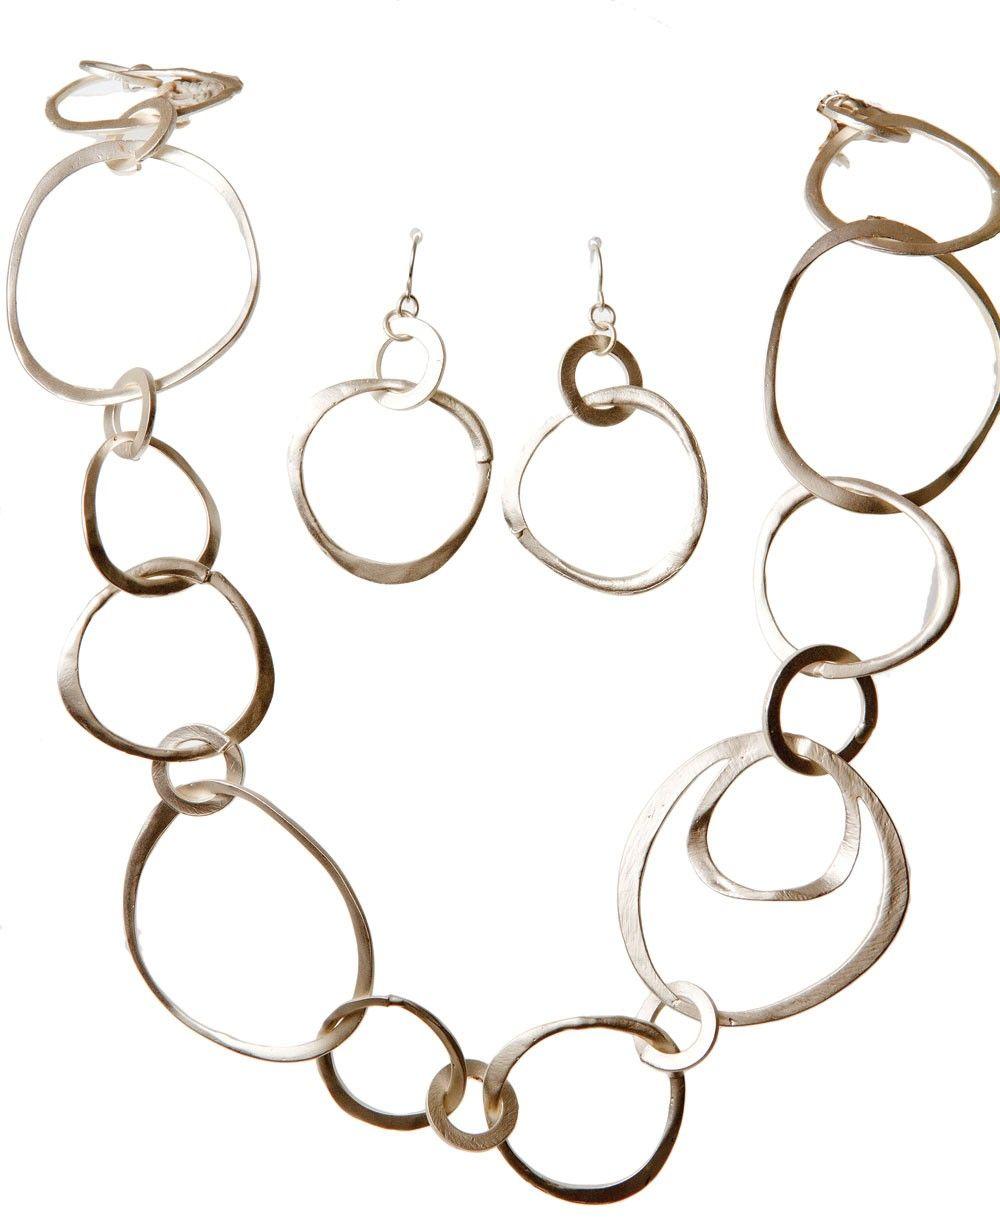 Elegant Matte Silver Circles Necklace — MUSEUM OUTLETS